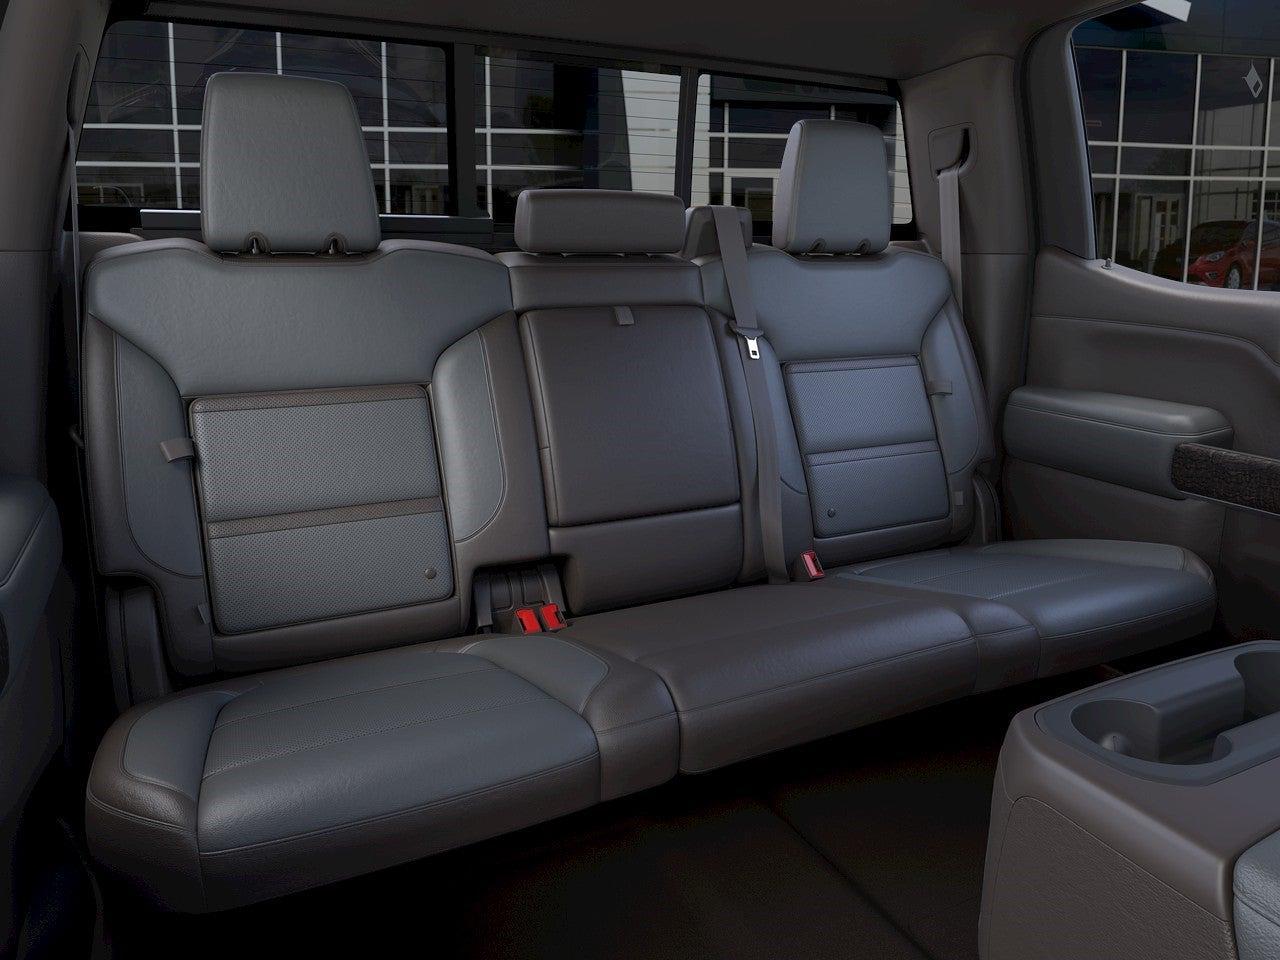 2021 Sierra 1500 Crew Cab 4x4,  Pickup #V21261 - photo 34